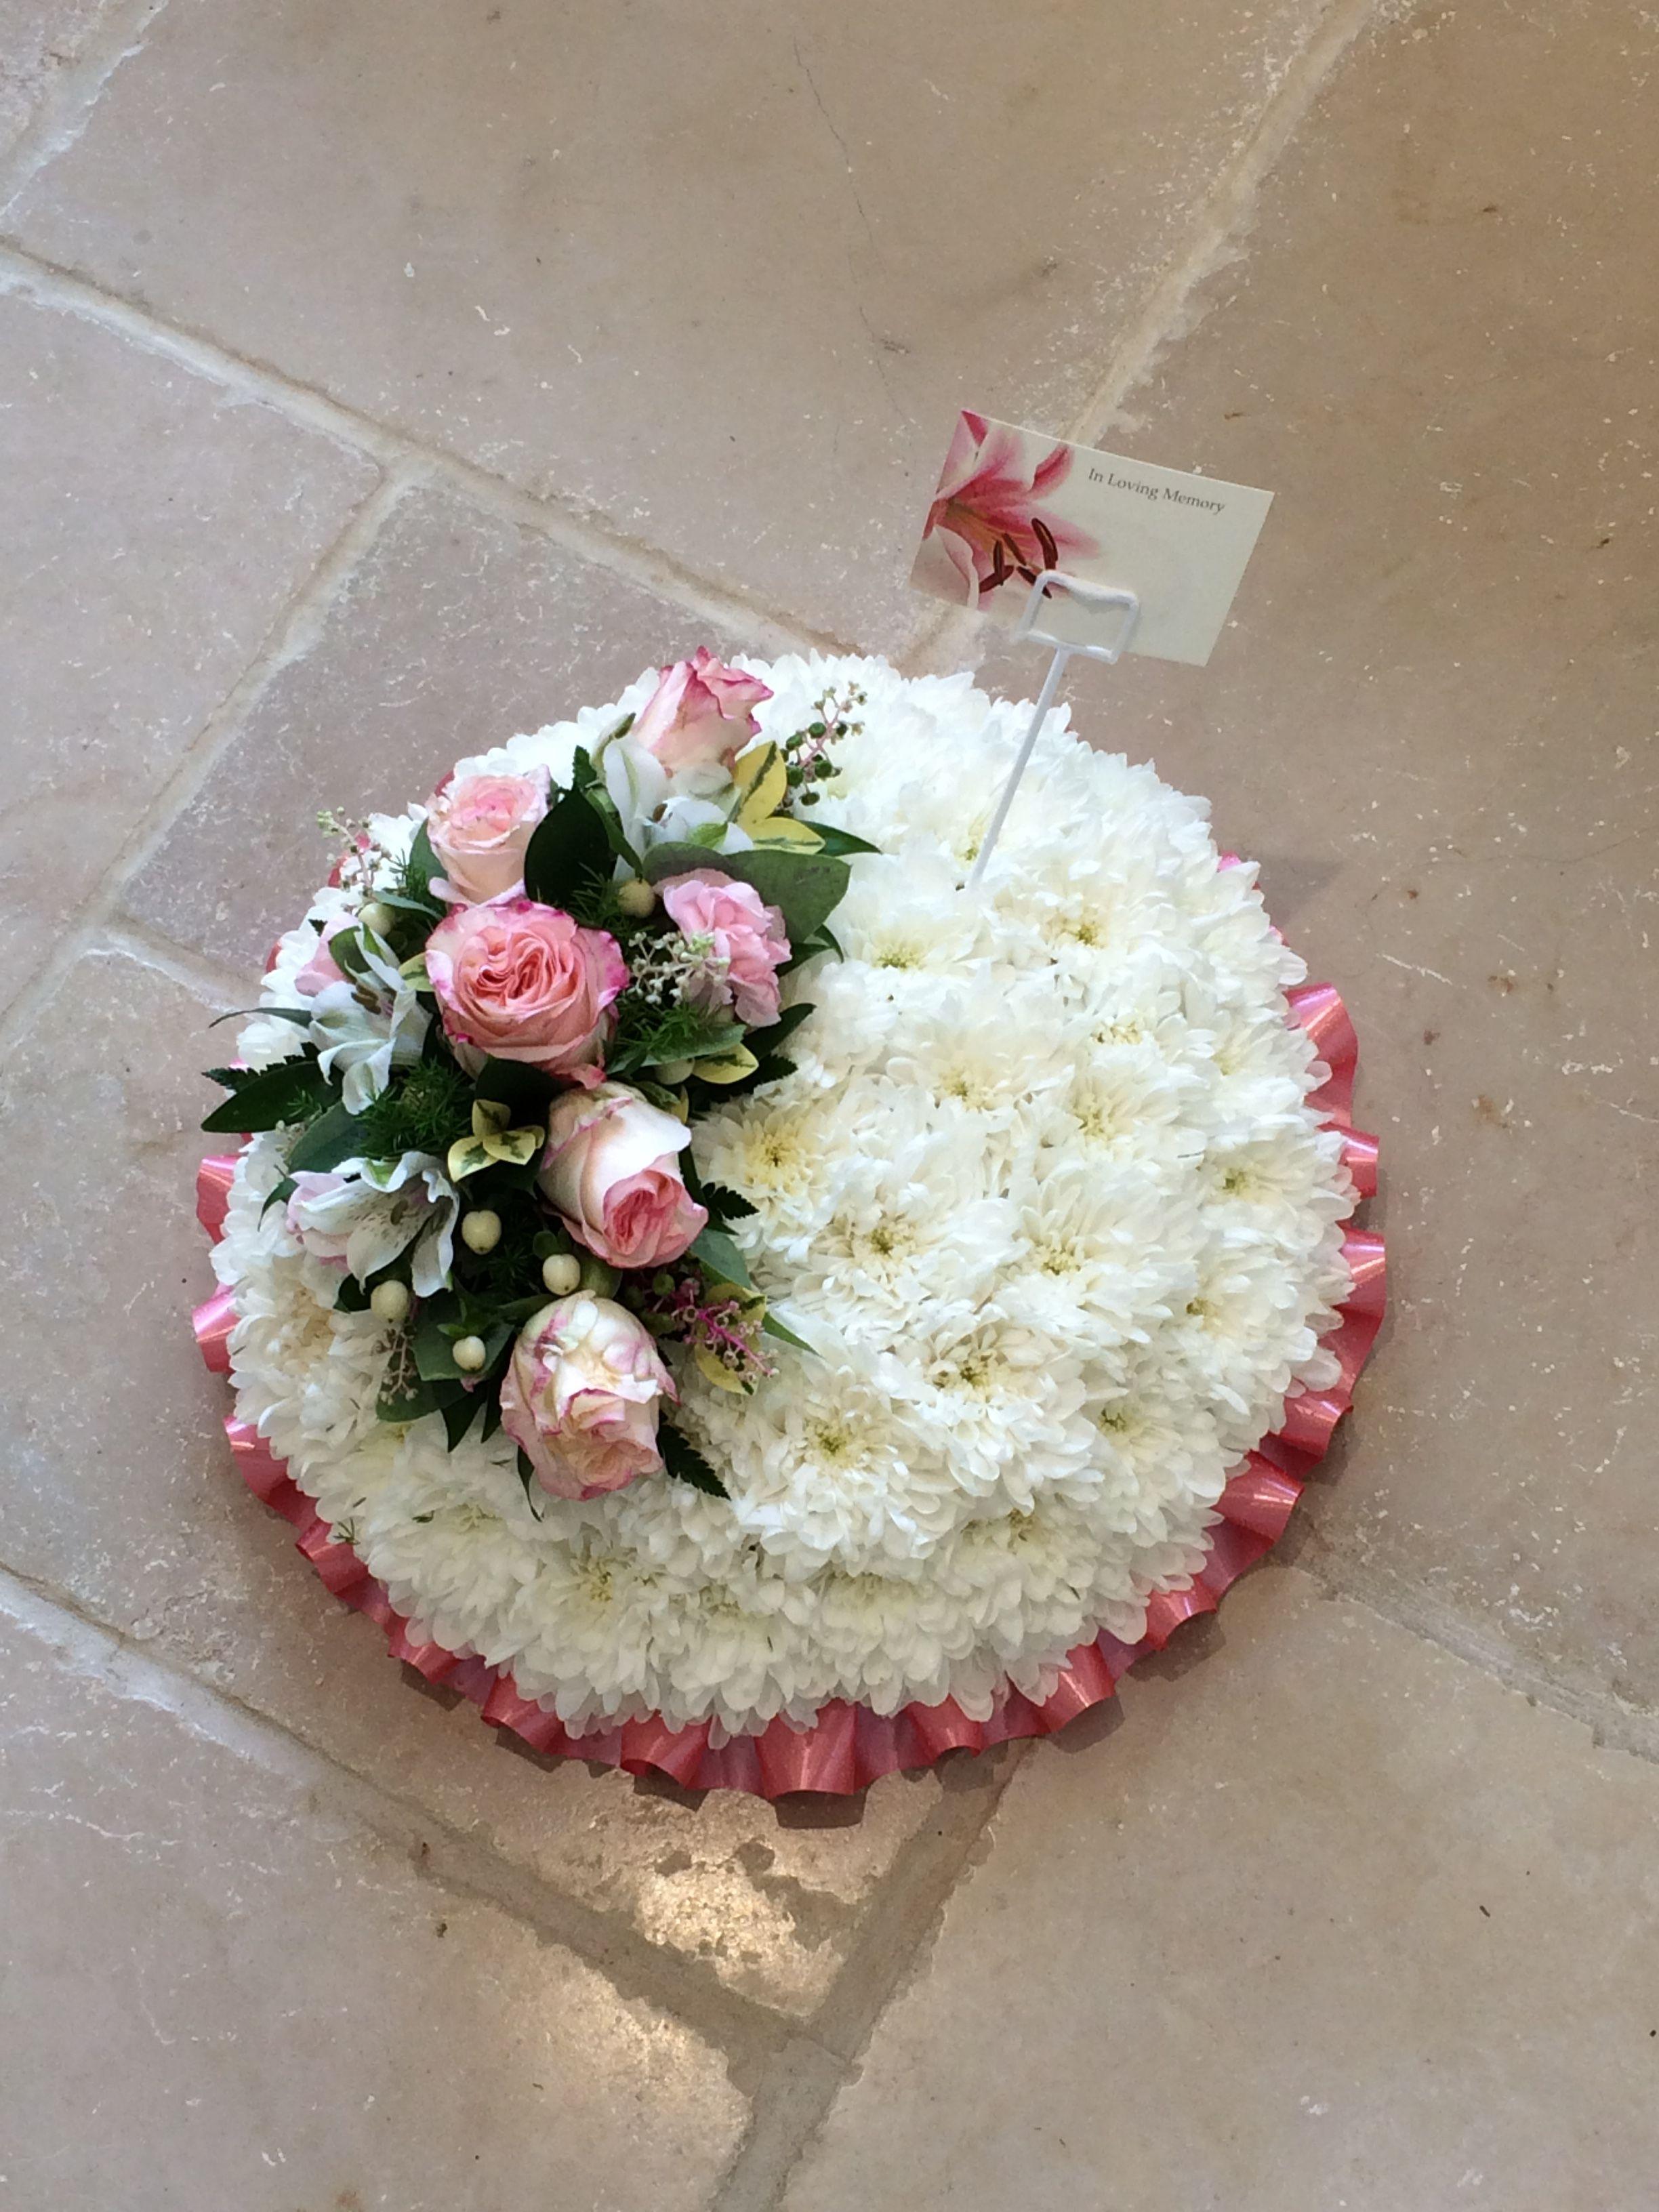 Simply beautiful funeral posy tribute White chrysanthemum based